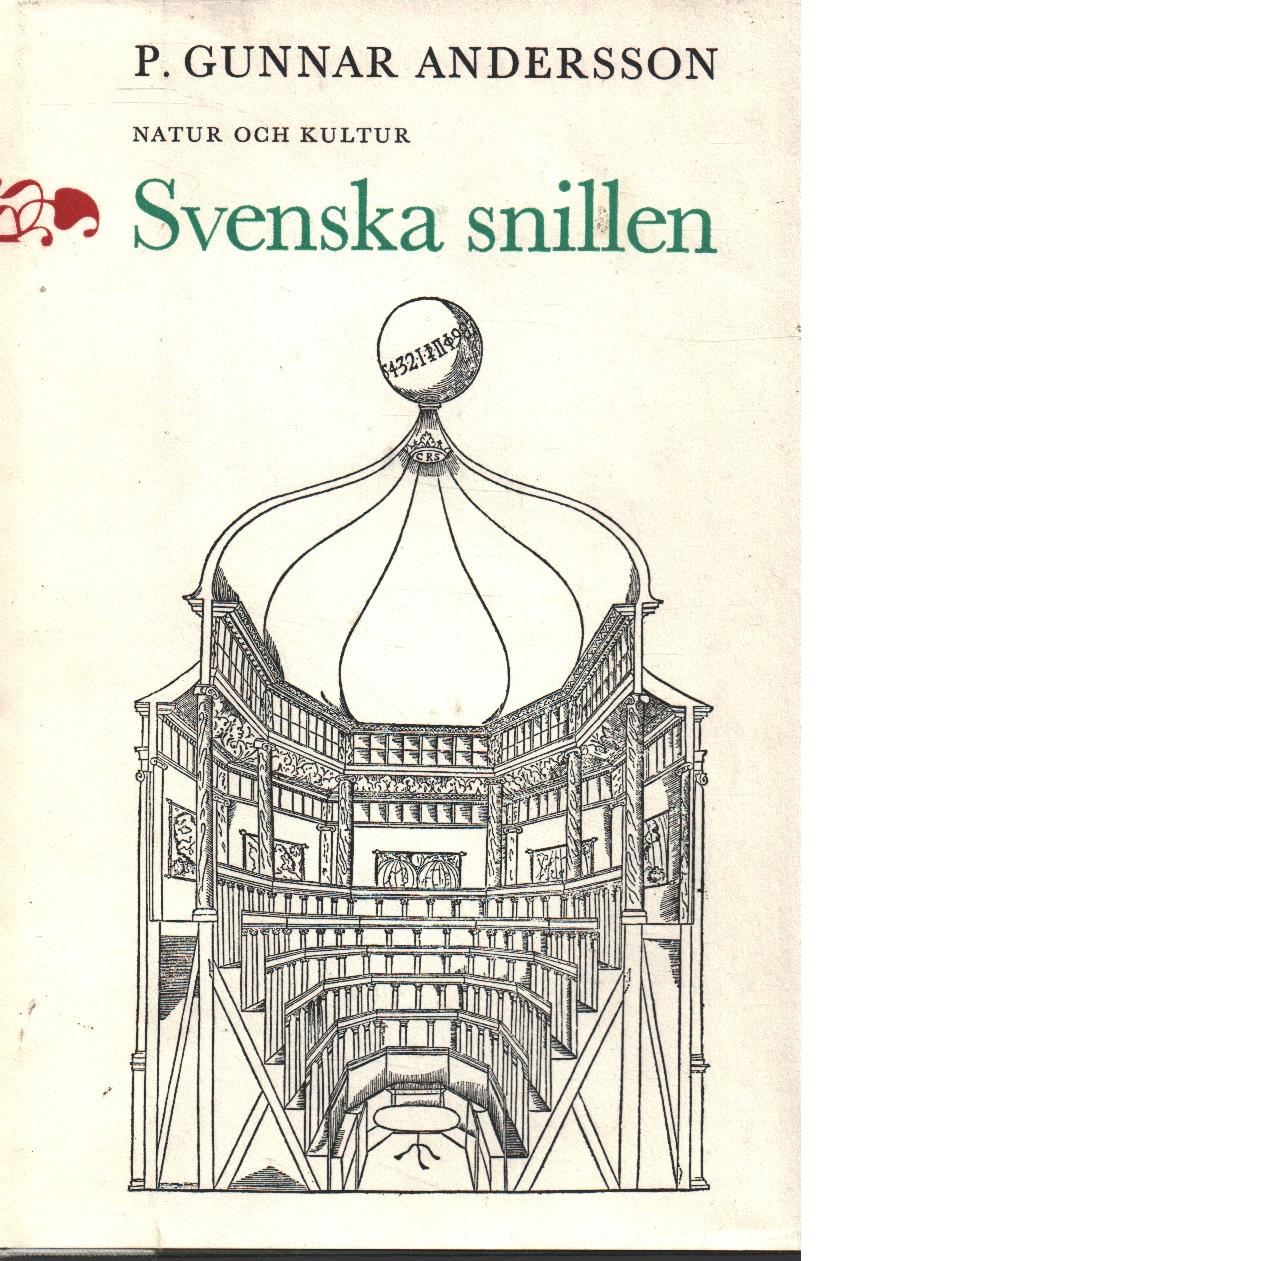 Svenska snillen : från Stiernhielm till Scheele - Andersson, P. Gunnar,